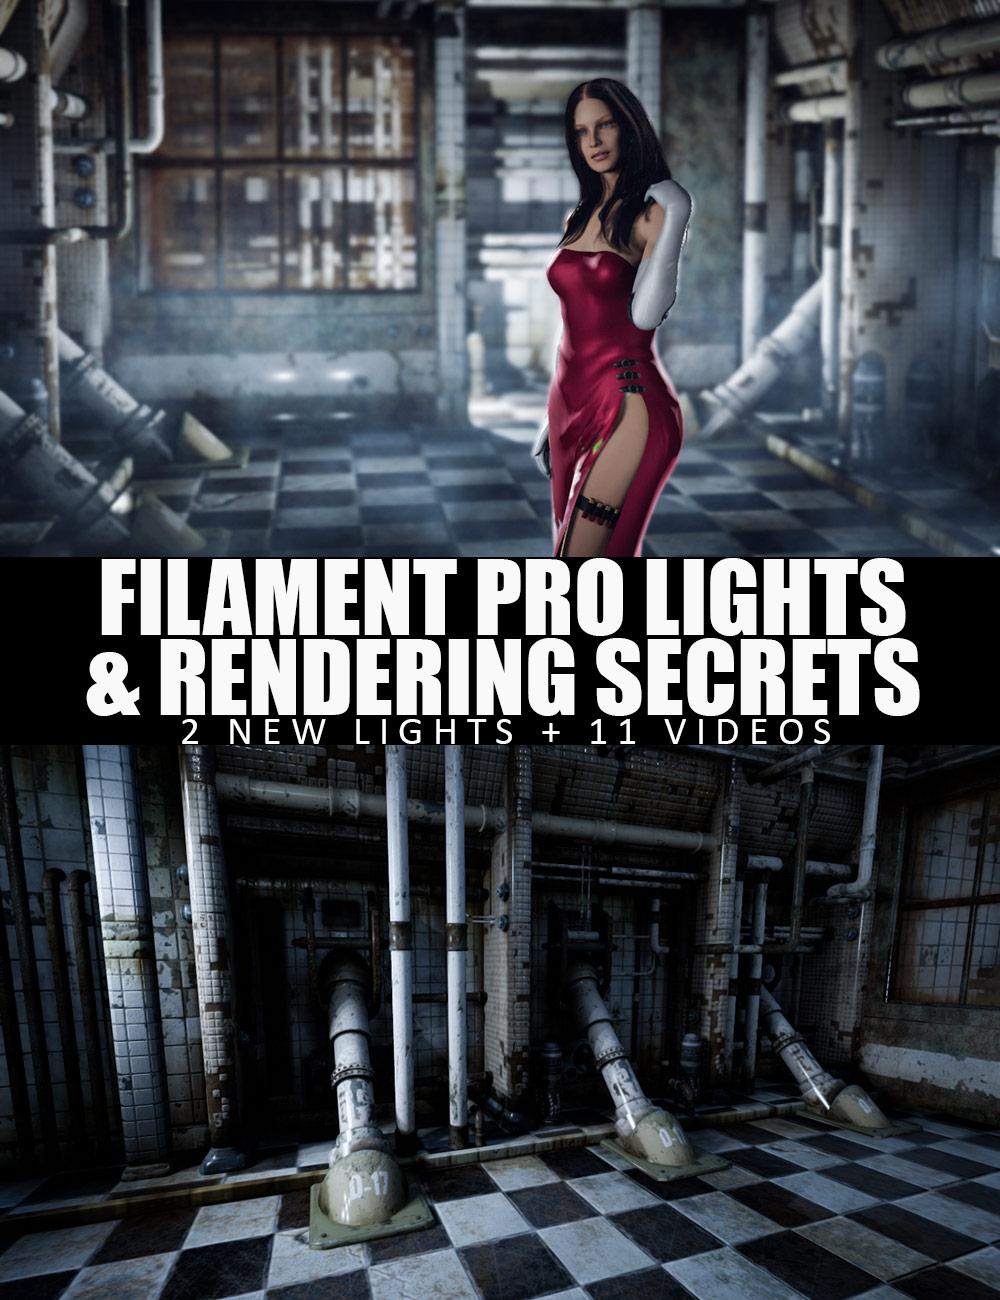 Filament PRO Lights And Rendering Secrets - 2 New Lights + Video Tutorial by: Dreamlight, 3D Models by Daz 3D